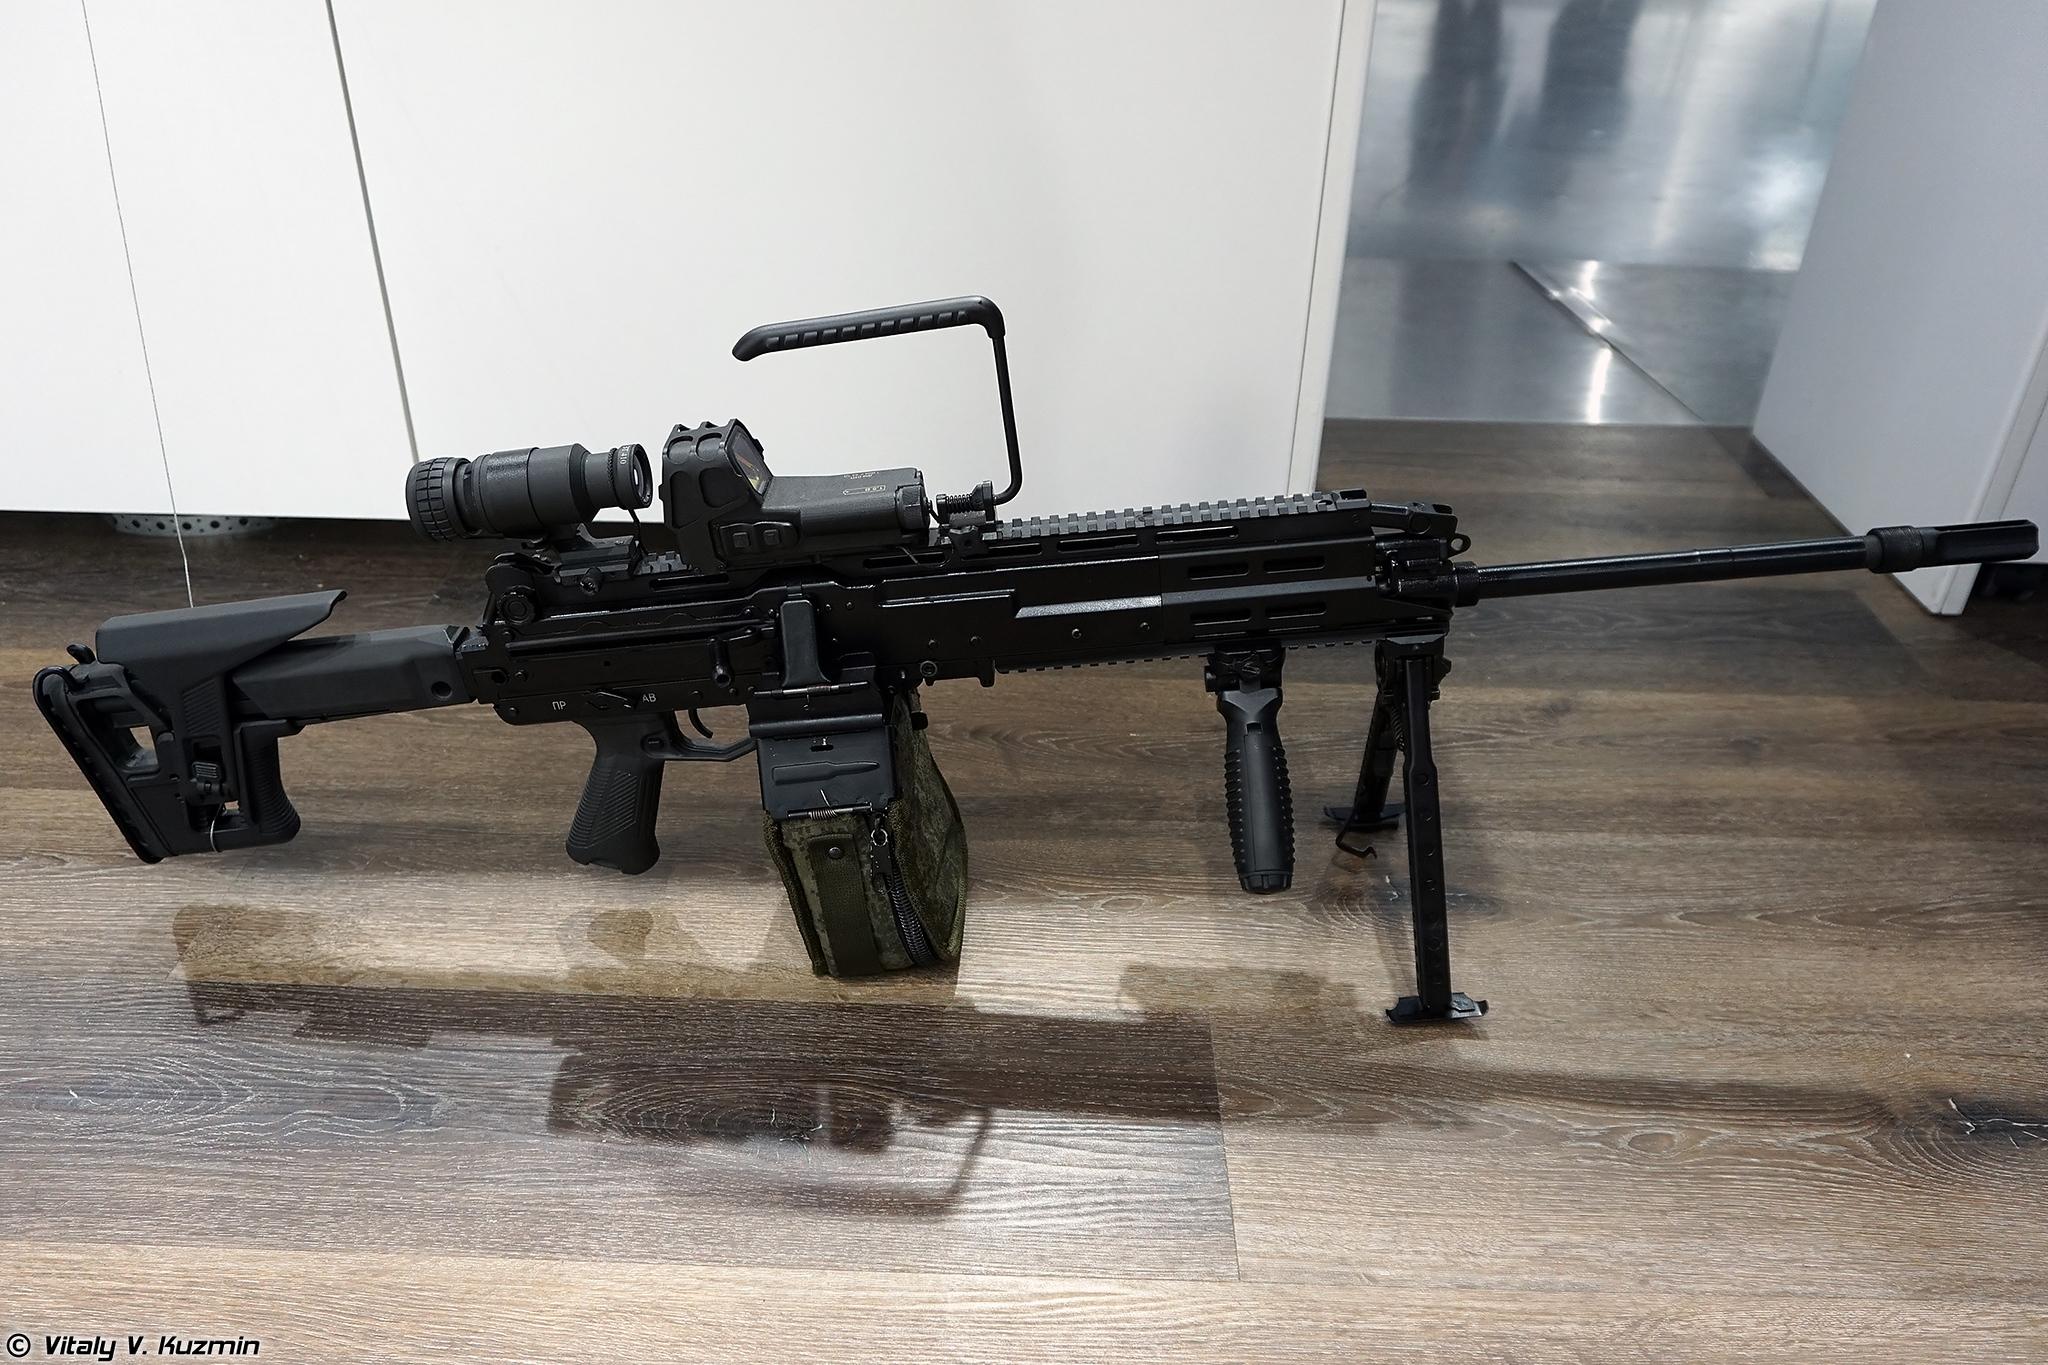 Russian Assault Rifles/Carbines/Machine Guns Thread: #2 - Page 10 Army-2020-Pavilions-004-X4